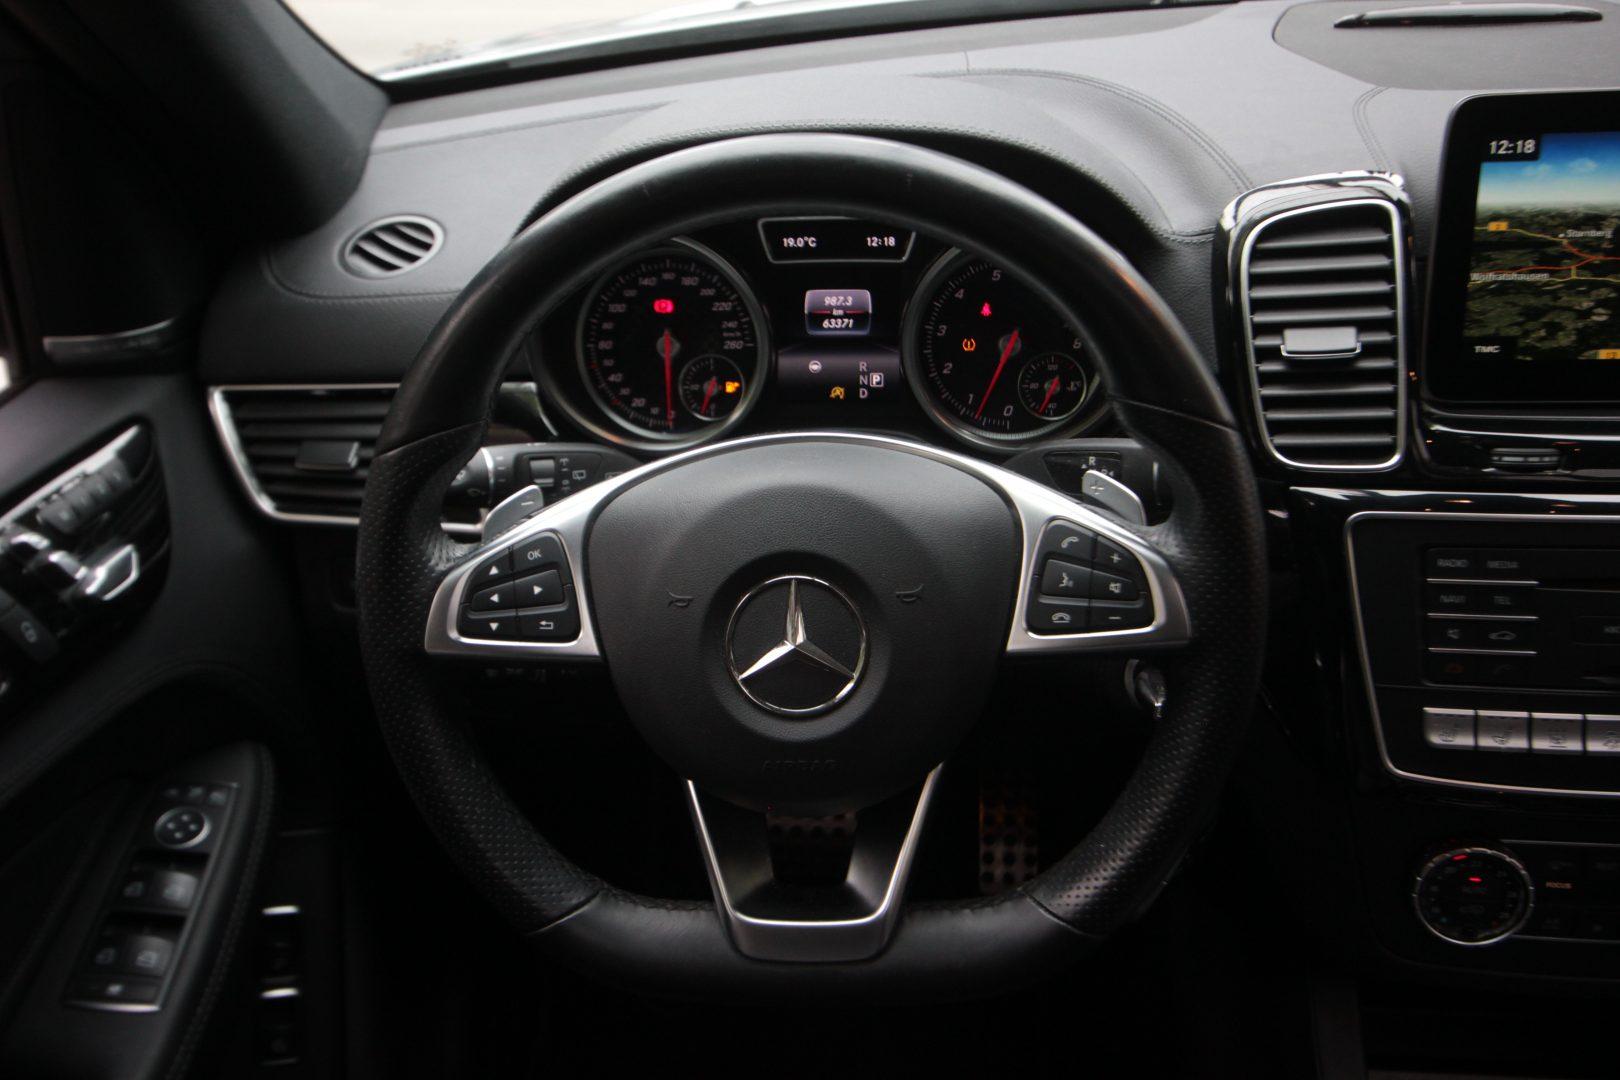 AIL Mercedes-Benz GLE 450 AMG 4Matic 1